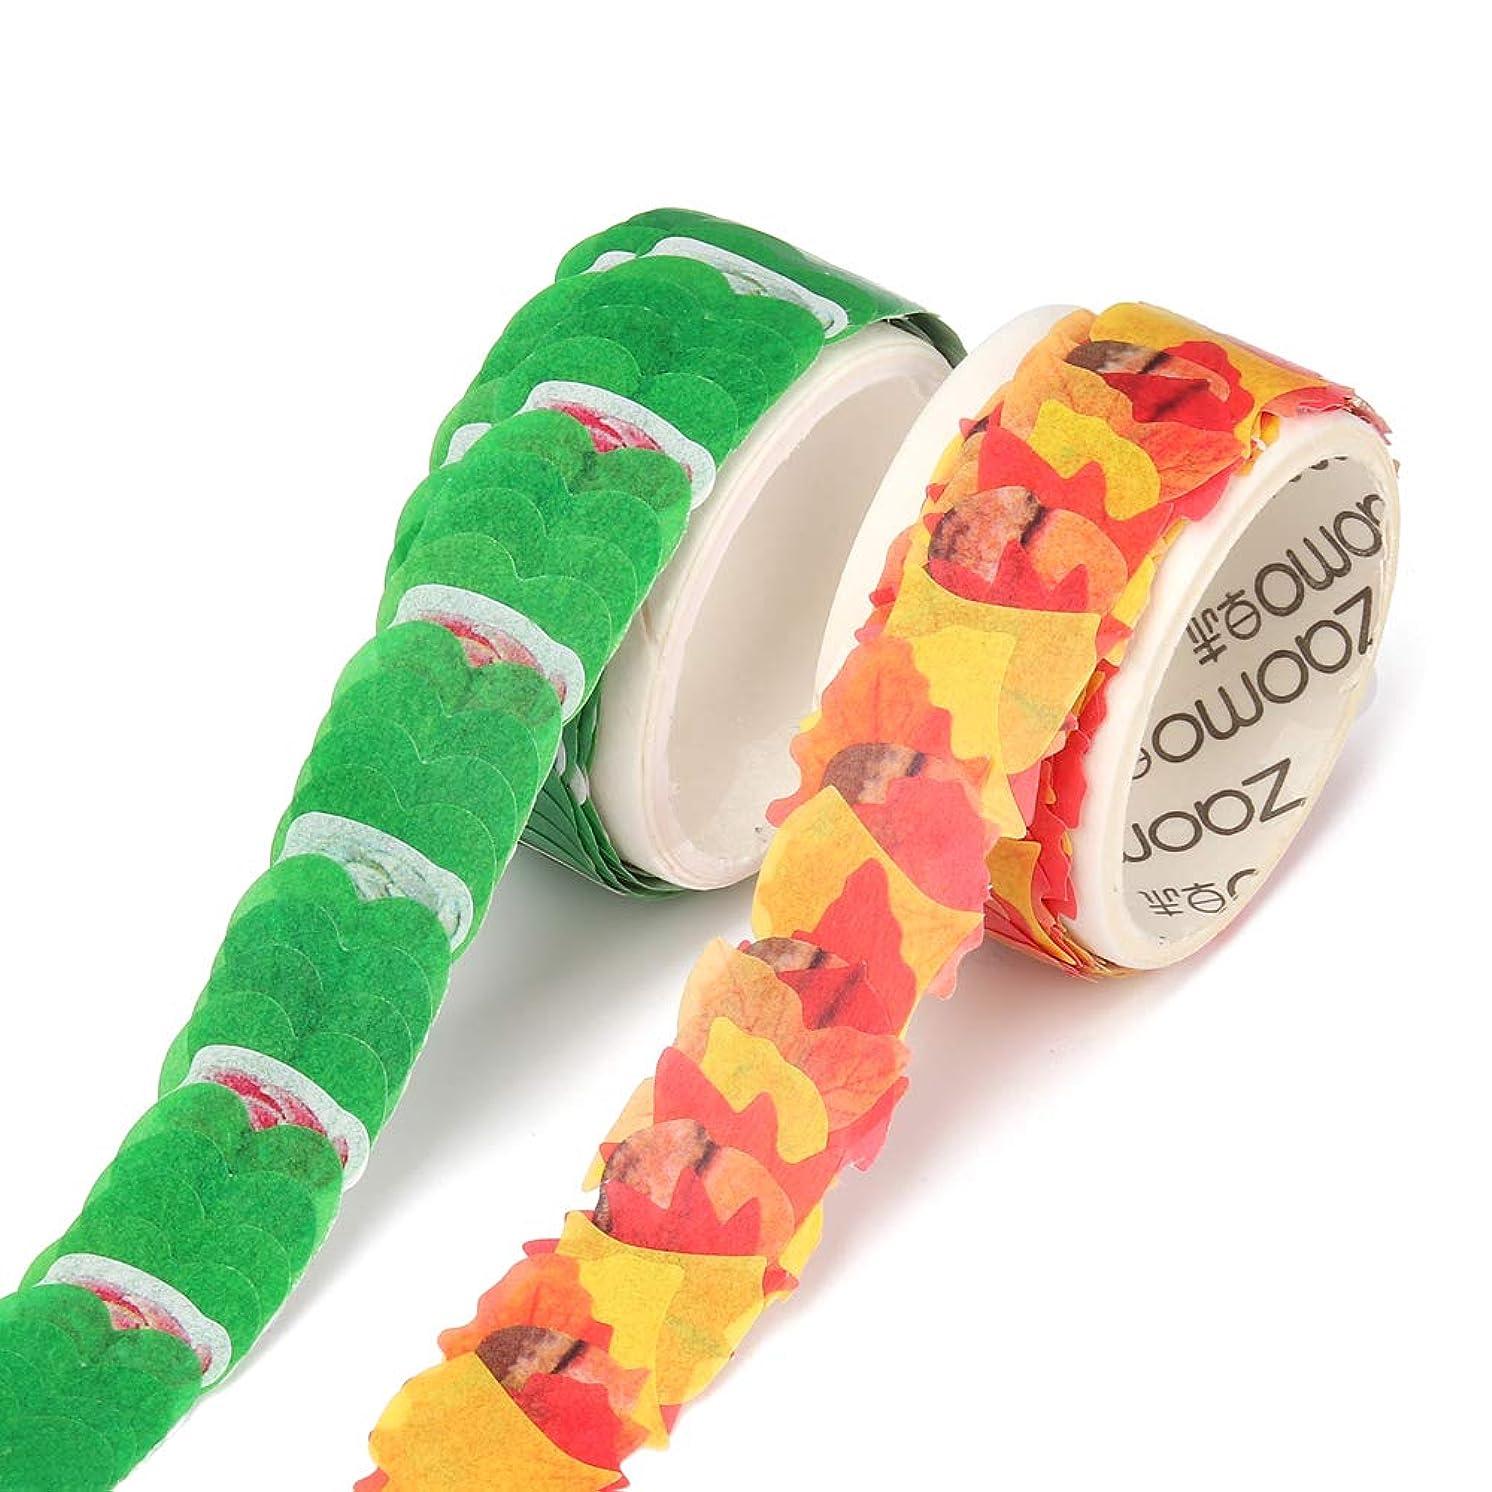 Molshine 2 Roll Creative Floral Petal Washi Tape, Masking Tape Decorative Decals,Crafts DIY Petal Stickers for Scrapbooking, Bullet Journal, Planner, 200 Petals/Roll (Four-Leaf-Grass & Maple Leaf) vjrfceqrpl8002